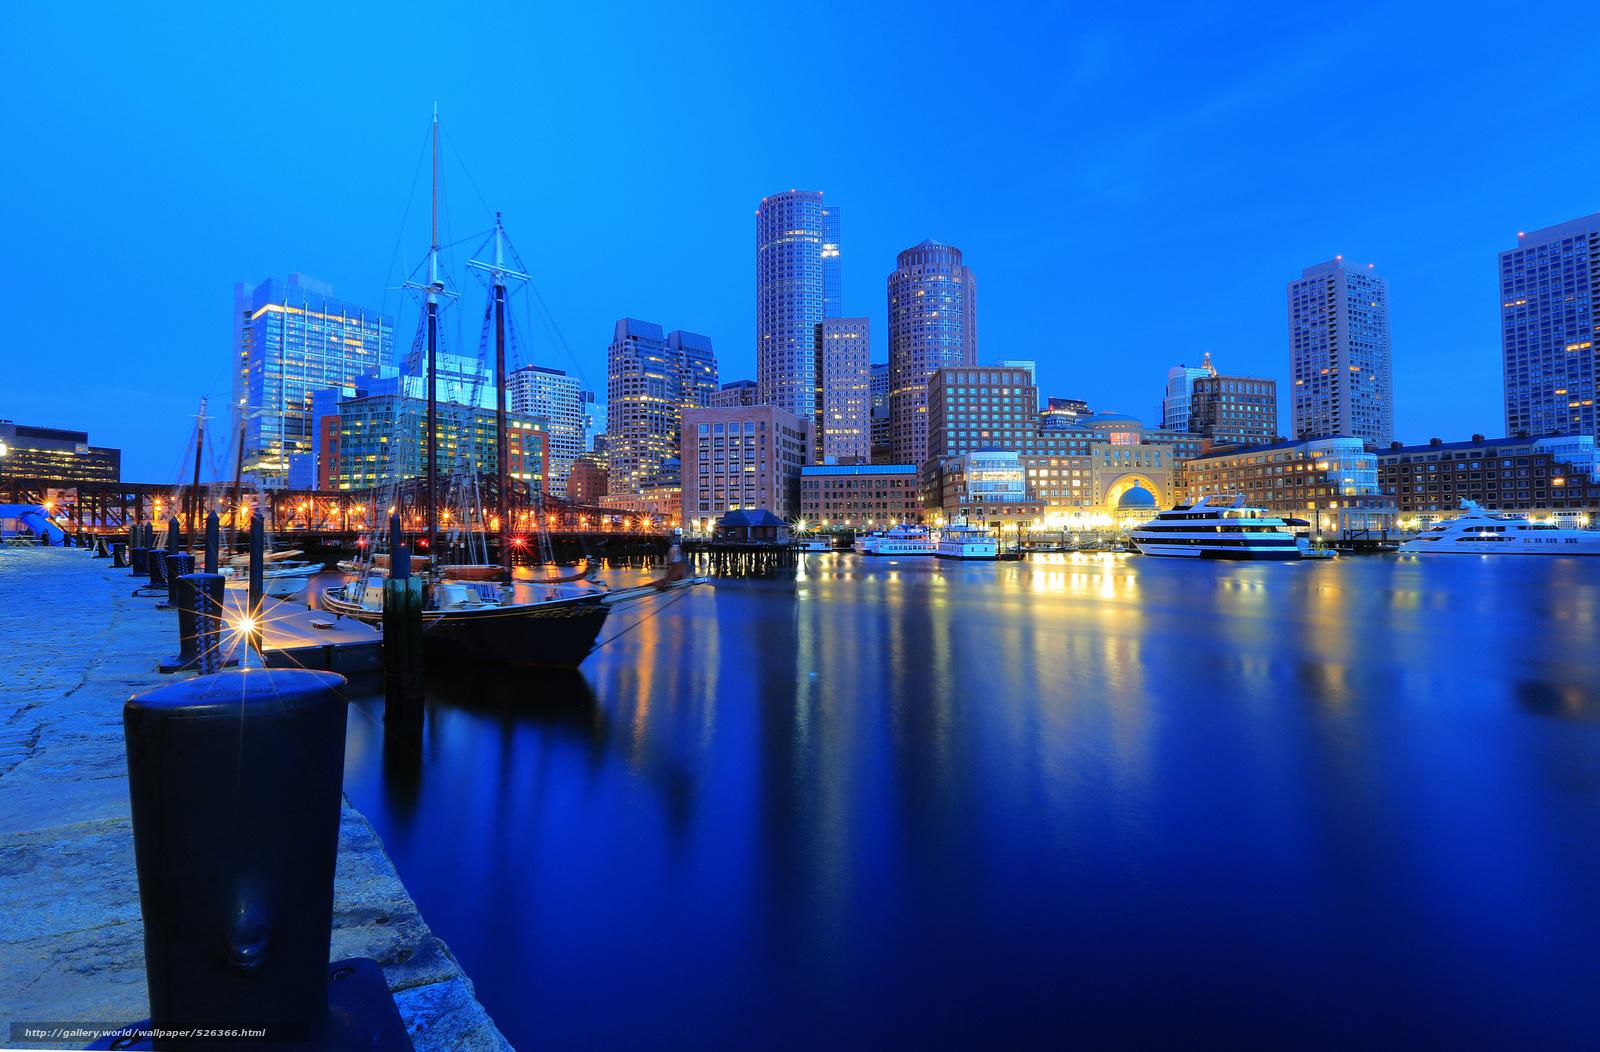 download wallpaper boston boston night city harbor free